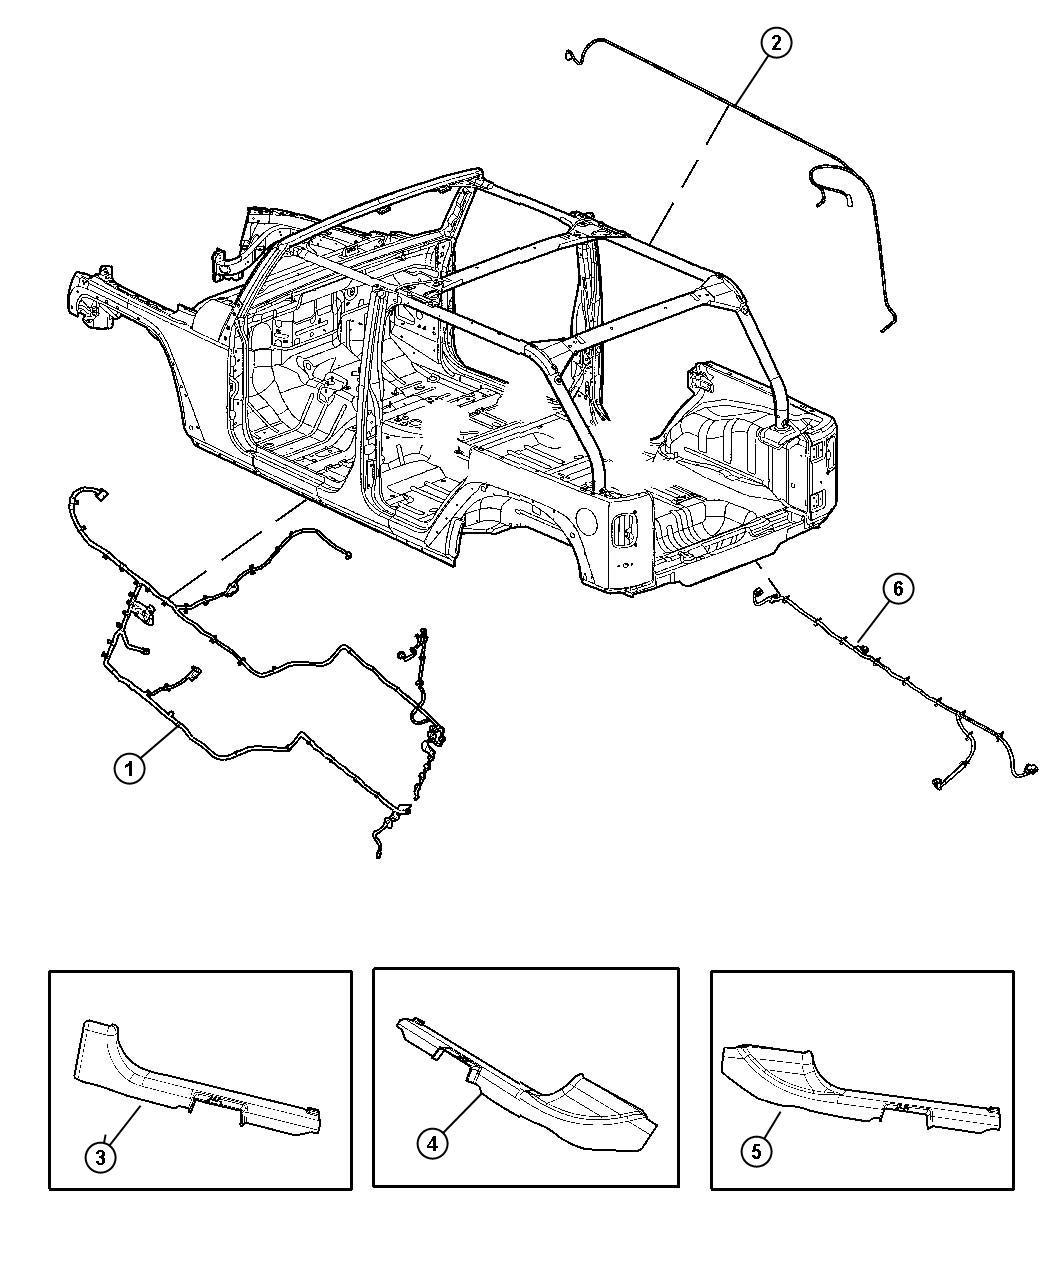 Jeep Wrangler Wiring  Body    Pwr Windows  Front 1